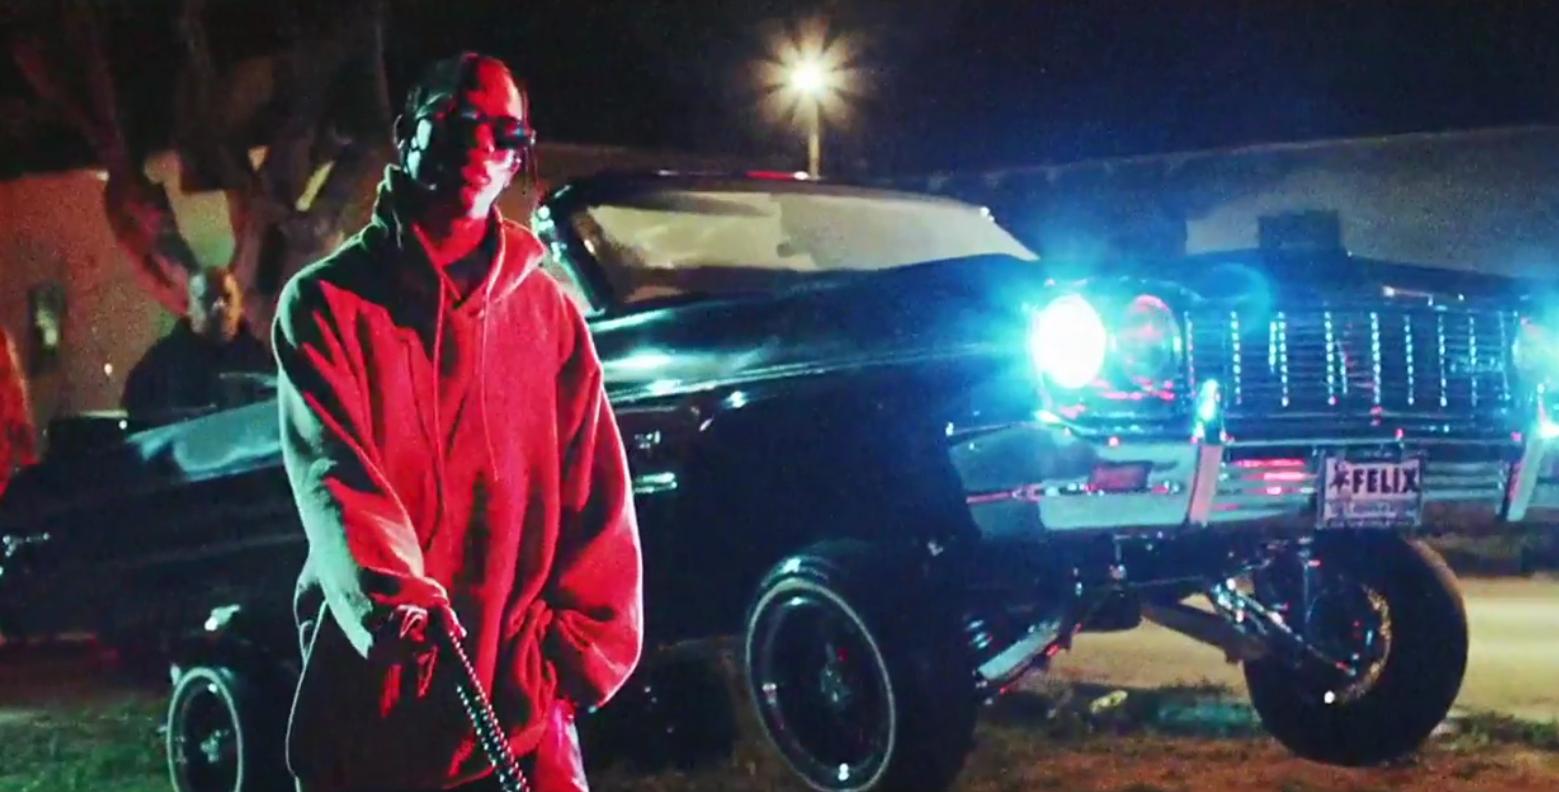 Travis Scott Goosebumps Feat Kendrick Lamar Official Music Video Goosebumps Travis Scott Travis Scott Music Videos